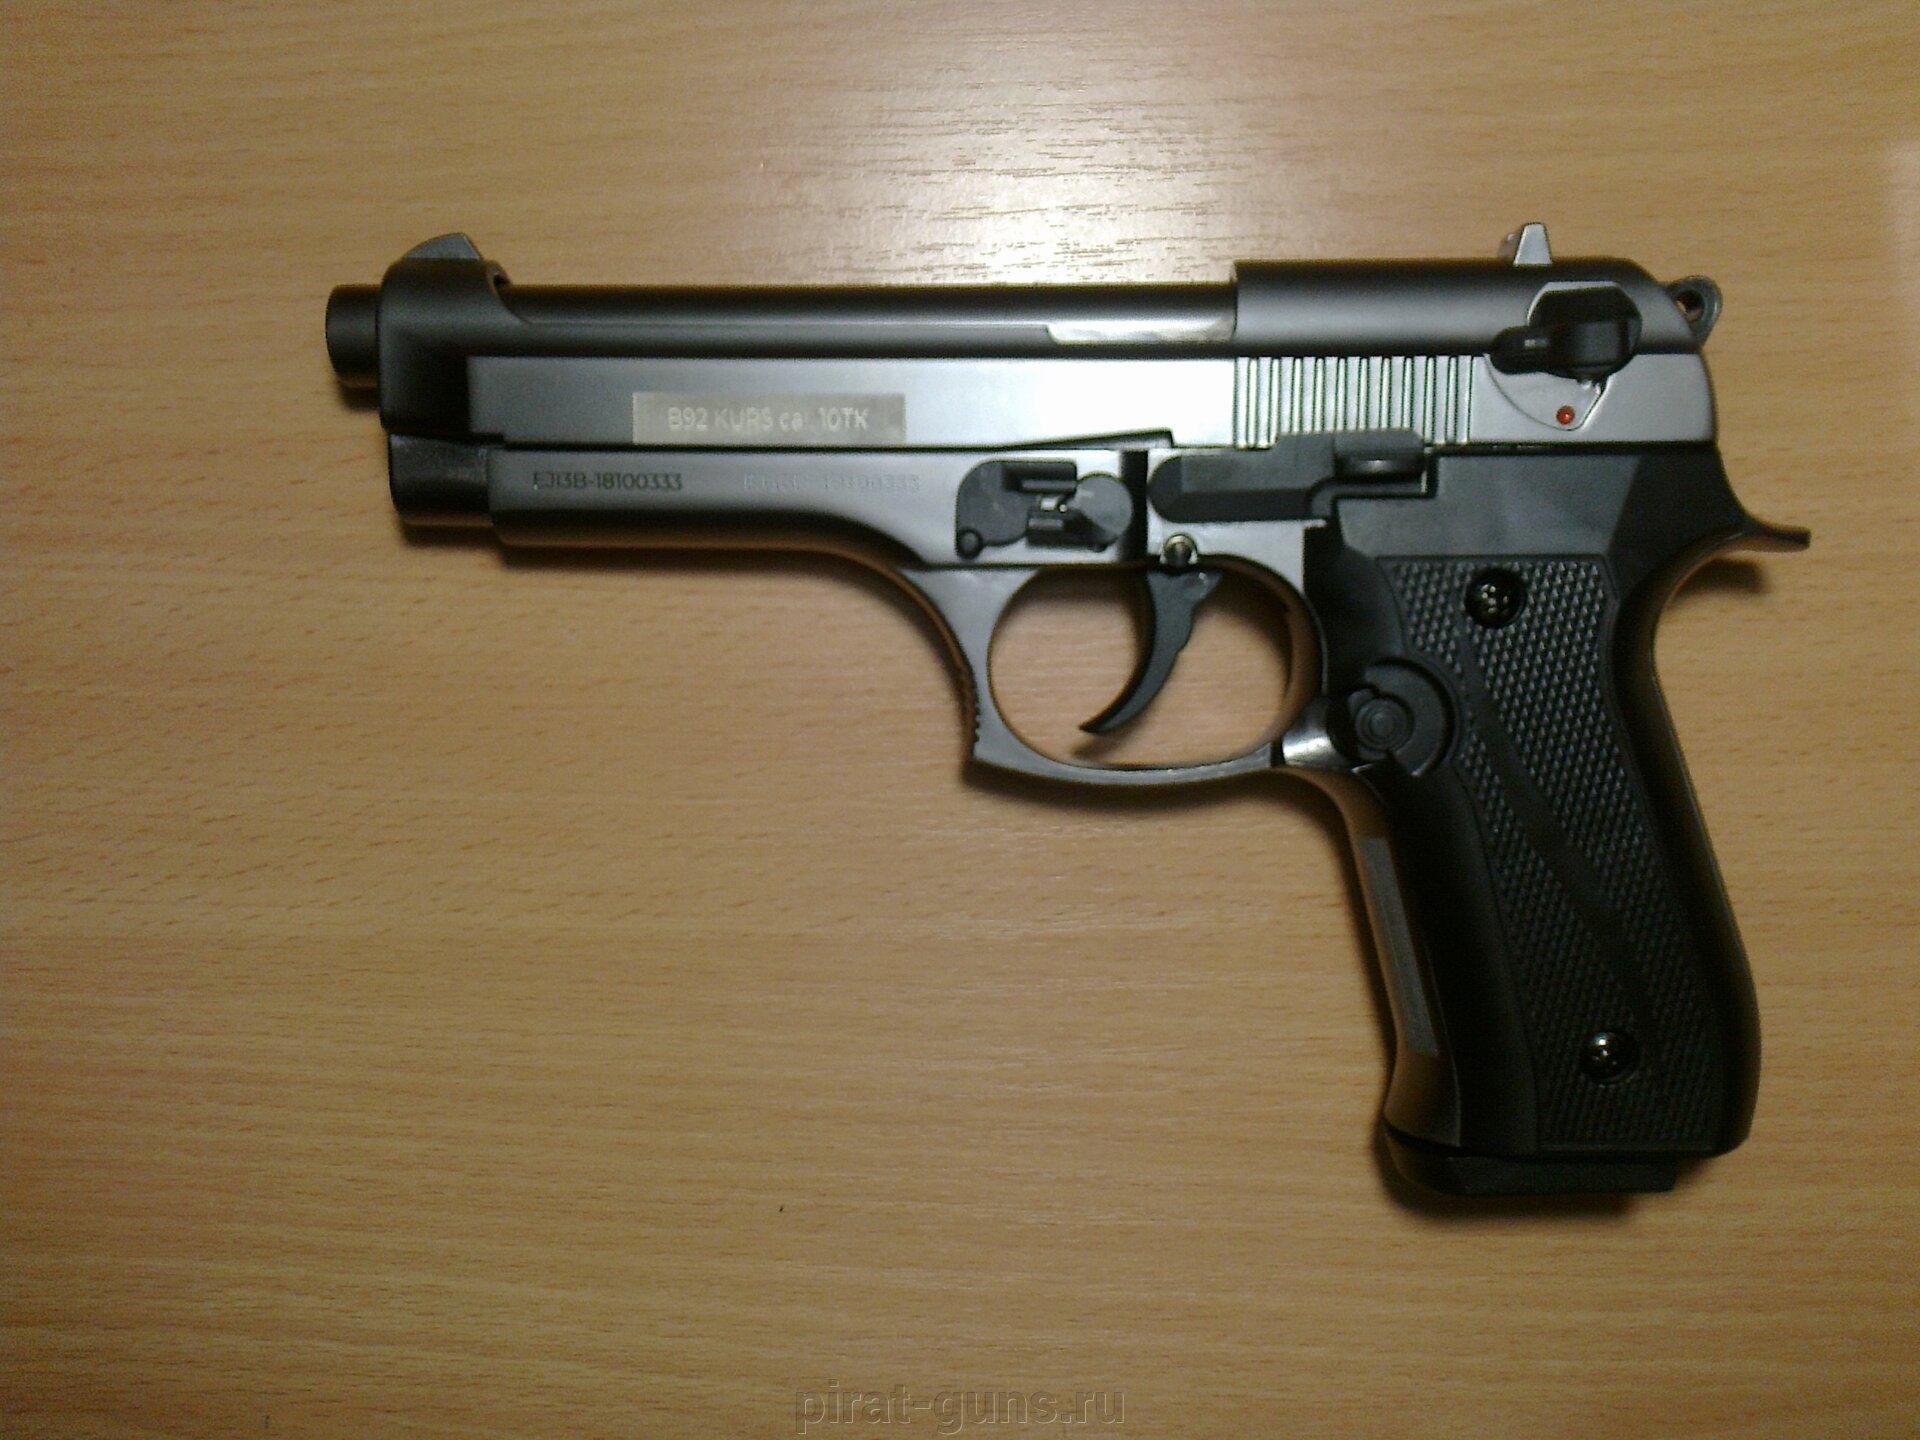 Охолощенный пистолет Beretta 92 (графит) - фото pic_531012948e70376982a1cfcef51036f0_1920x9000_1.jpg